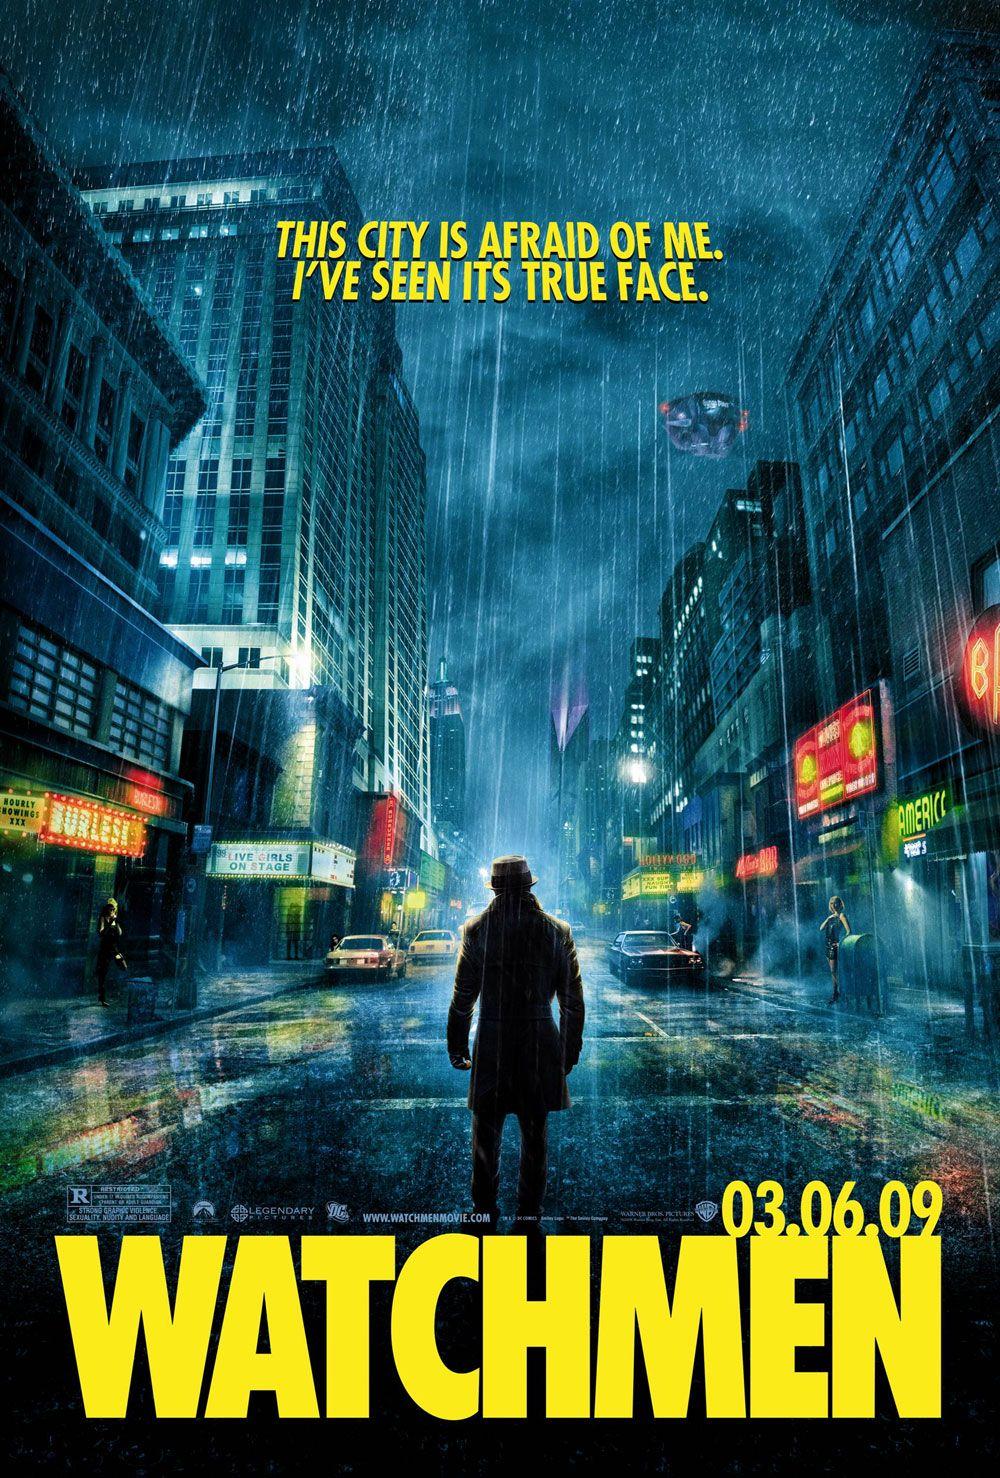 #Watchmen #superhero #graphic novel #comics #scifi #sciencefiction